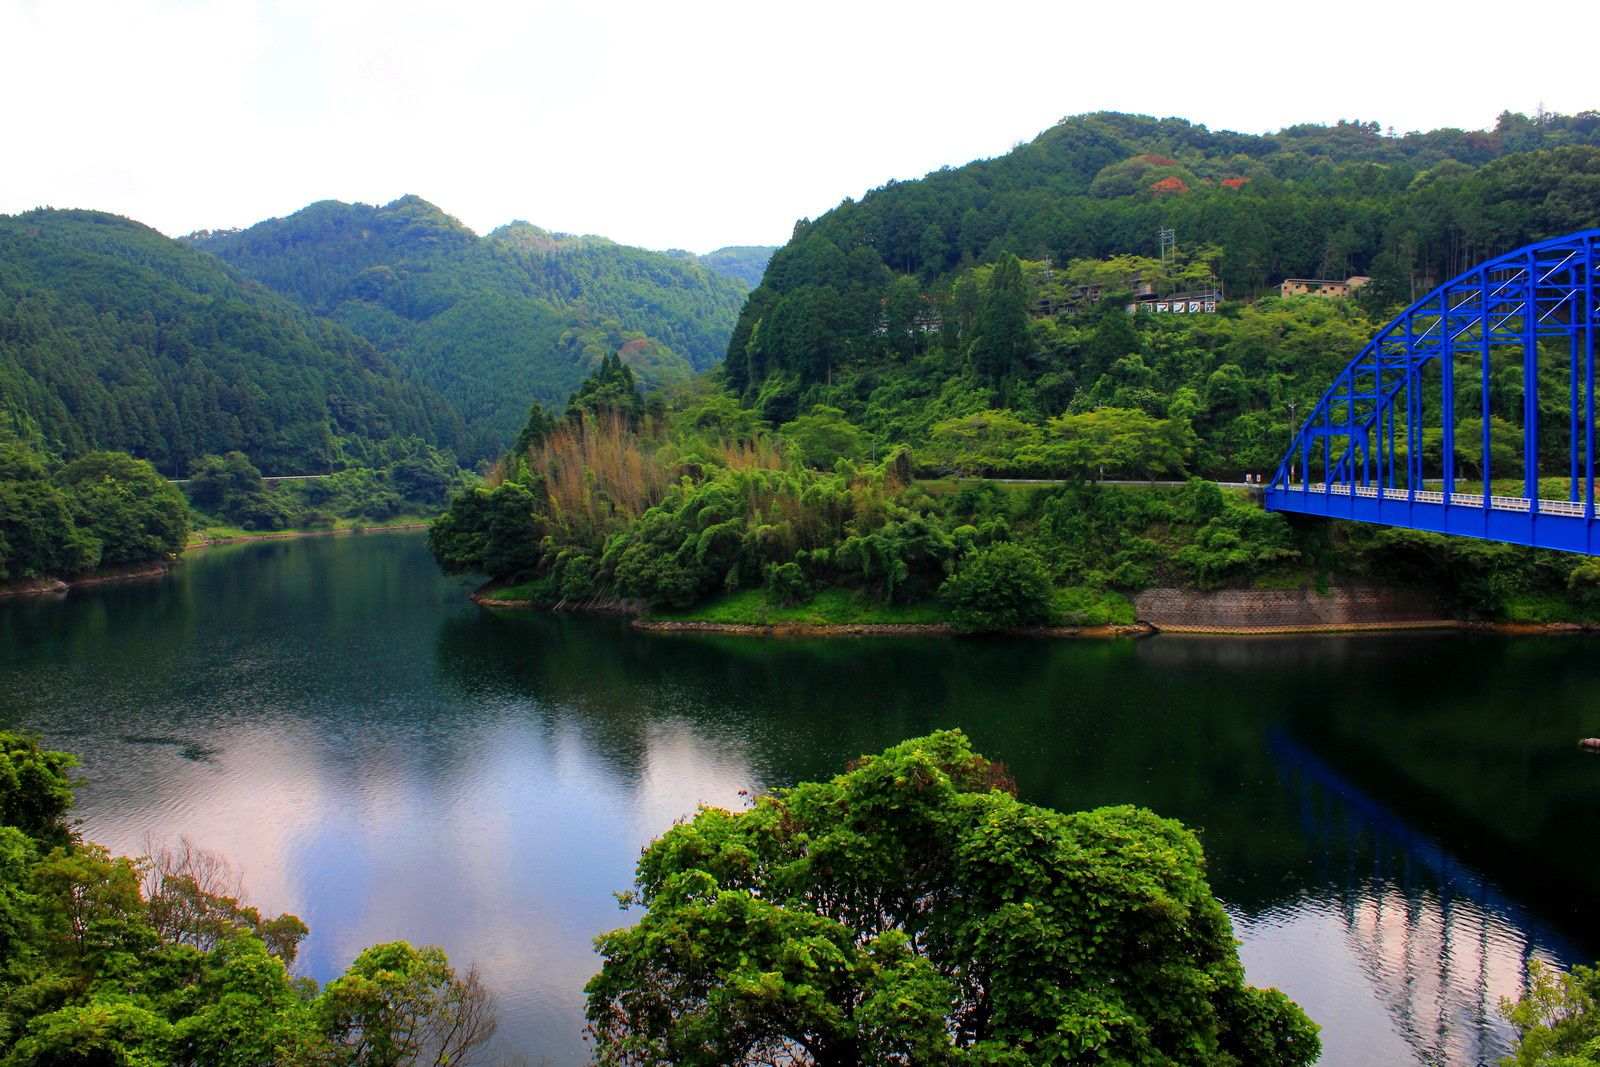 Le lac Shôrenji à Mie